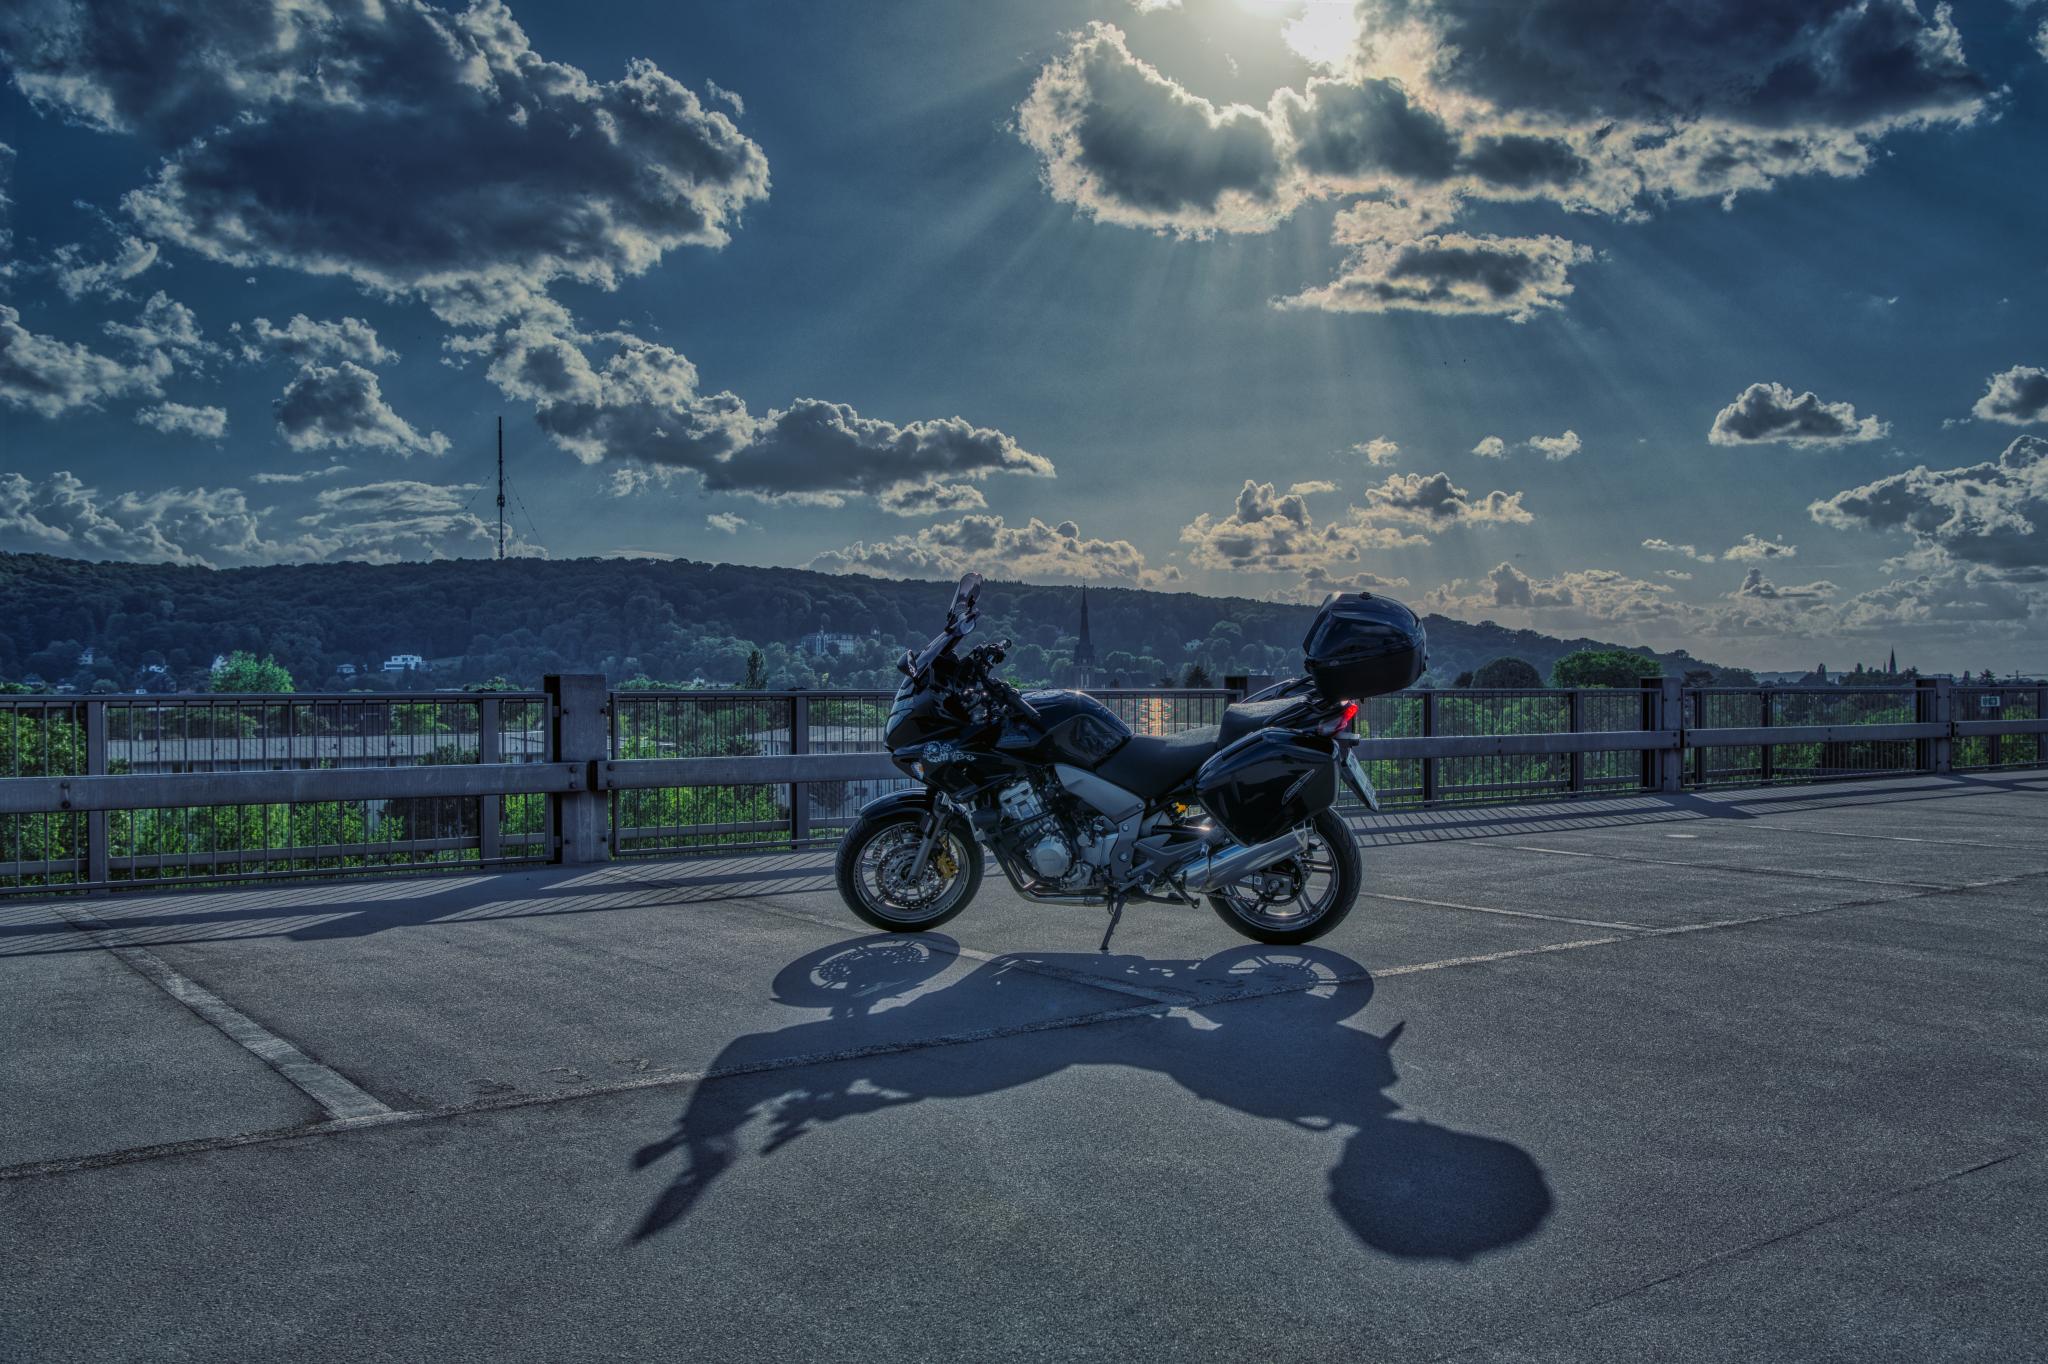 Honda CBF 1000 mit Schattenwurf vor bewölktem Himmel mit Sonnenstrahlen